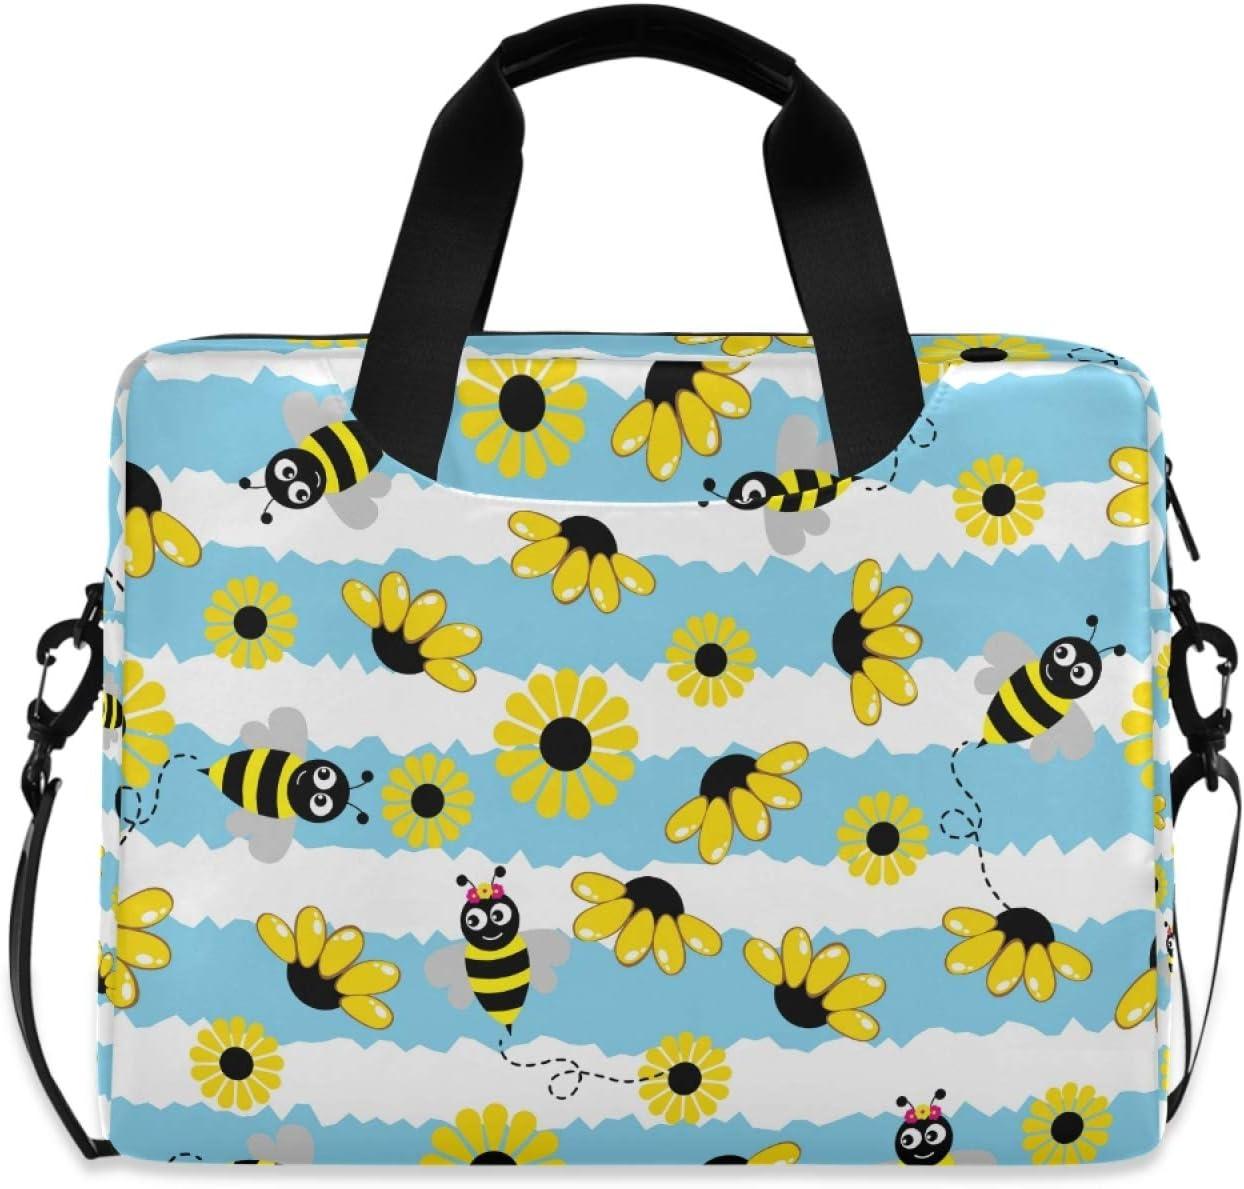 Hupery Bee Flowers Laptop Messenger Bargain Shoulder Bag Super Special SALE held Bags Com